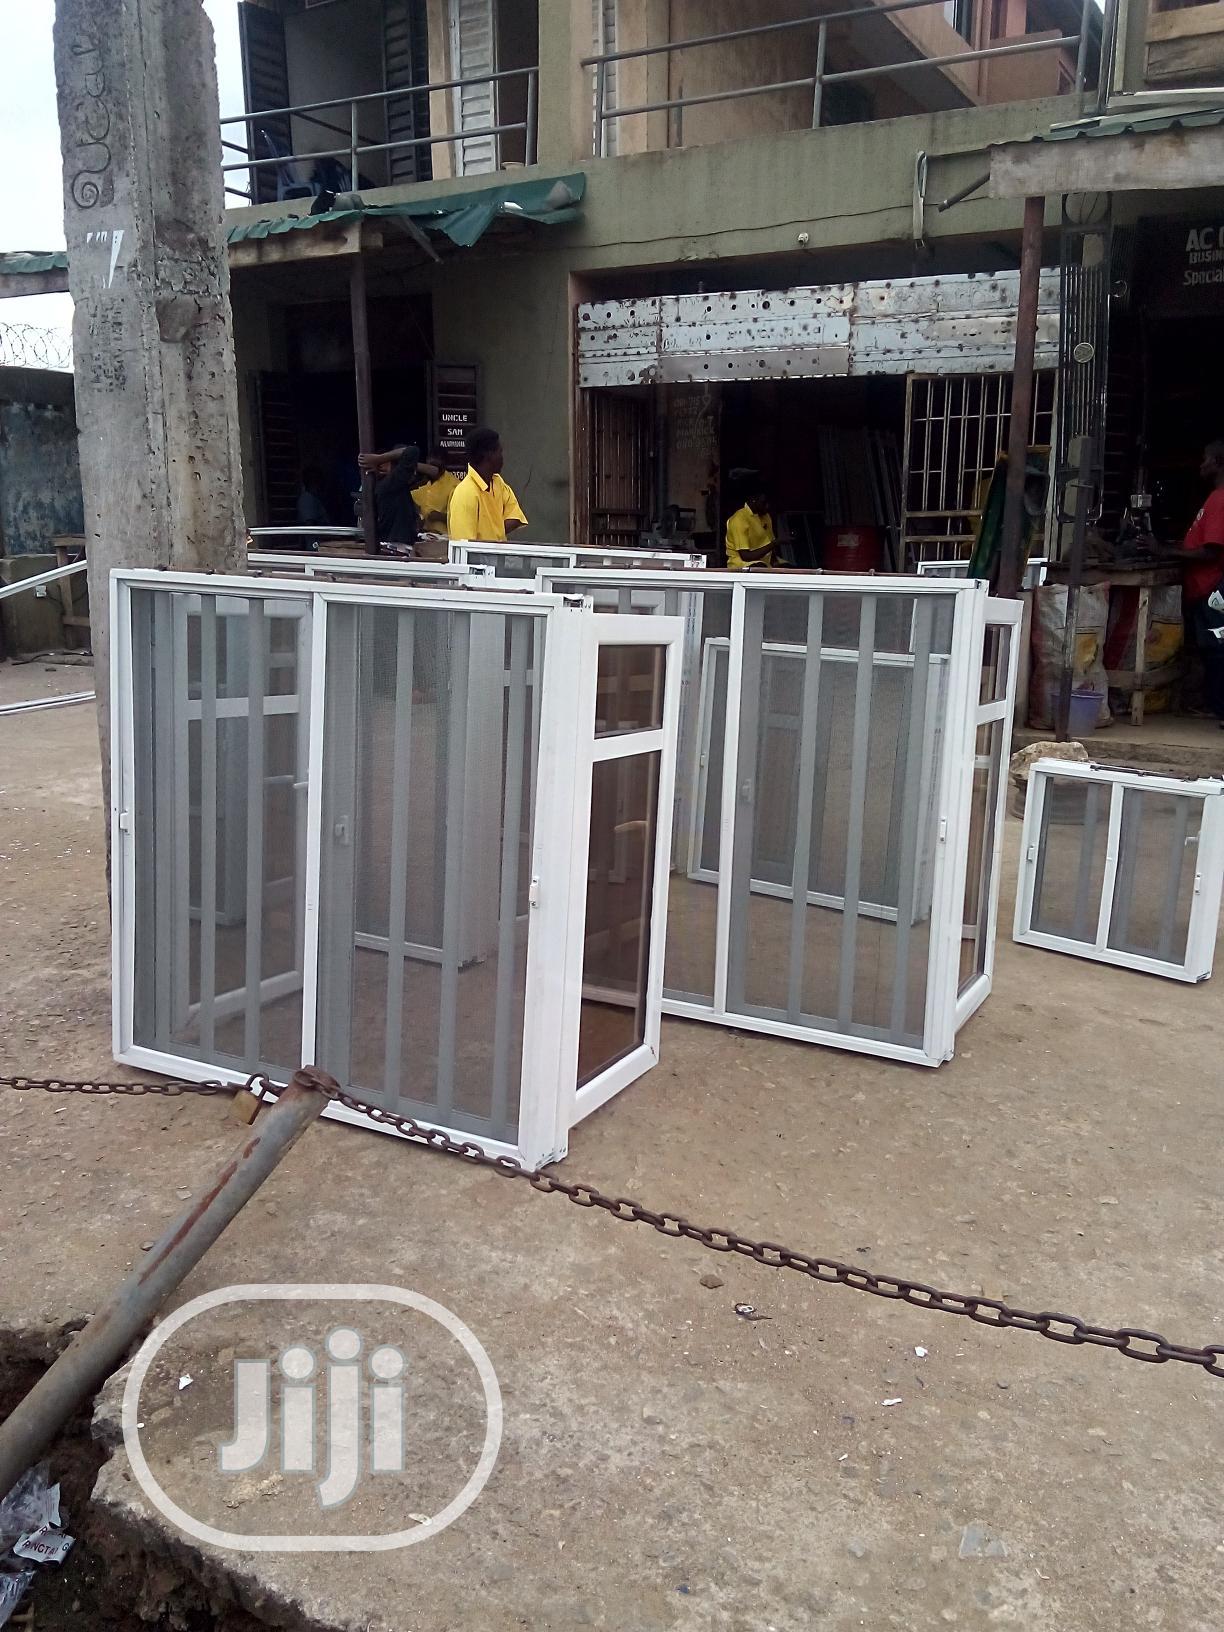 3-in-1 Aluminium WINDOW + NET + Iron-rod BURGLARY Proof | Windows for sale in Ewekoro, Ogun State, Nigeria